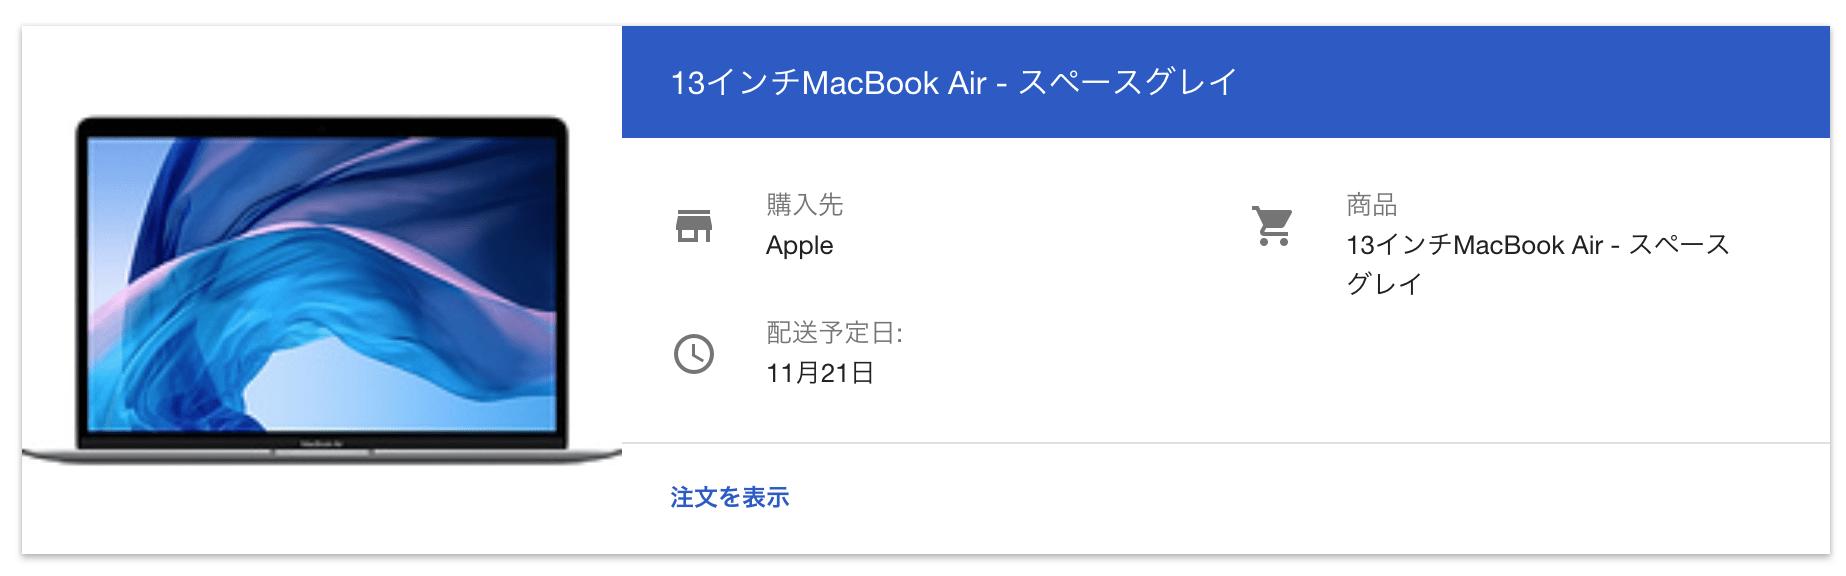 MacBook Air注文